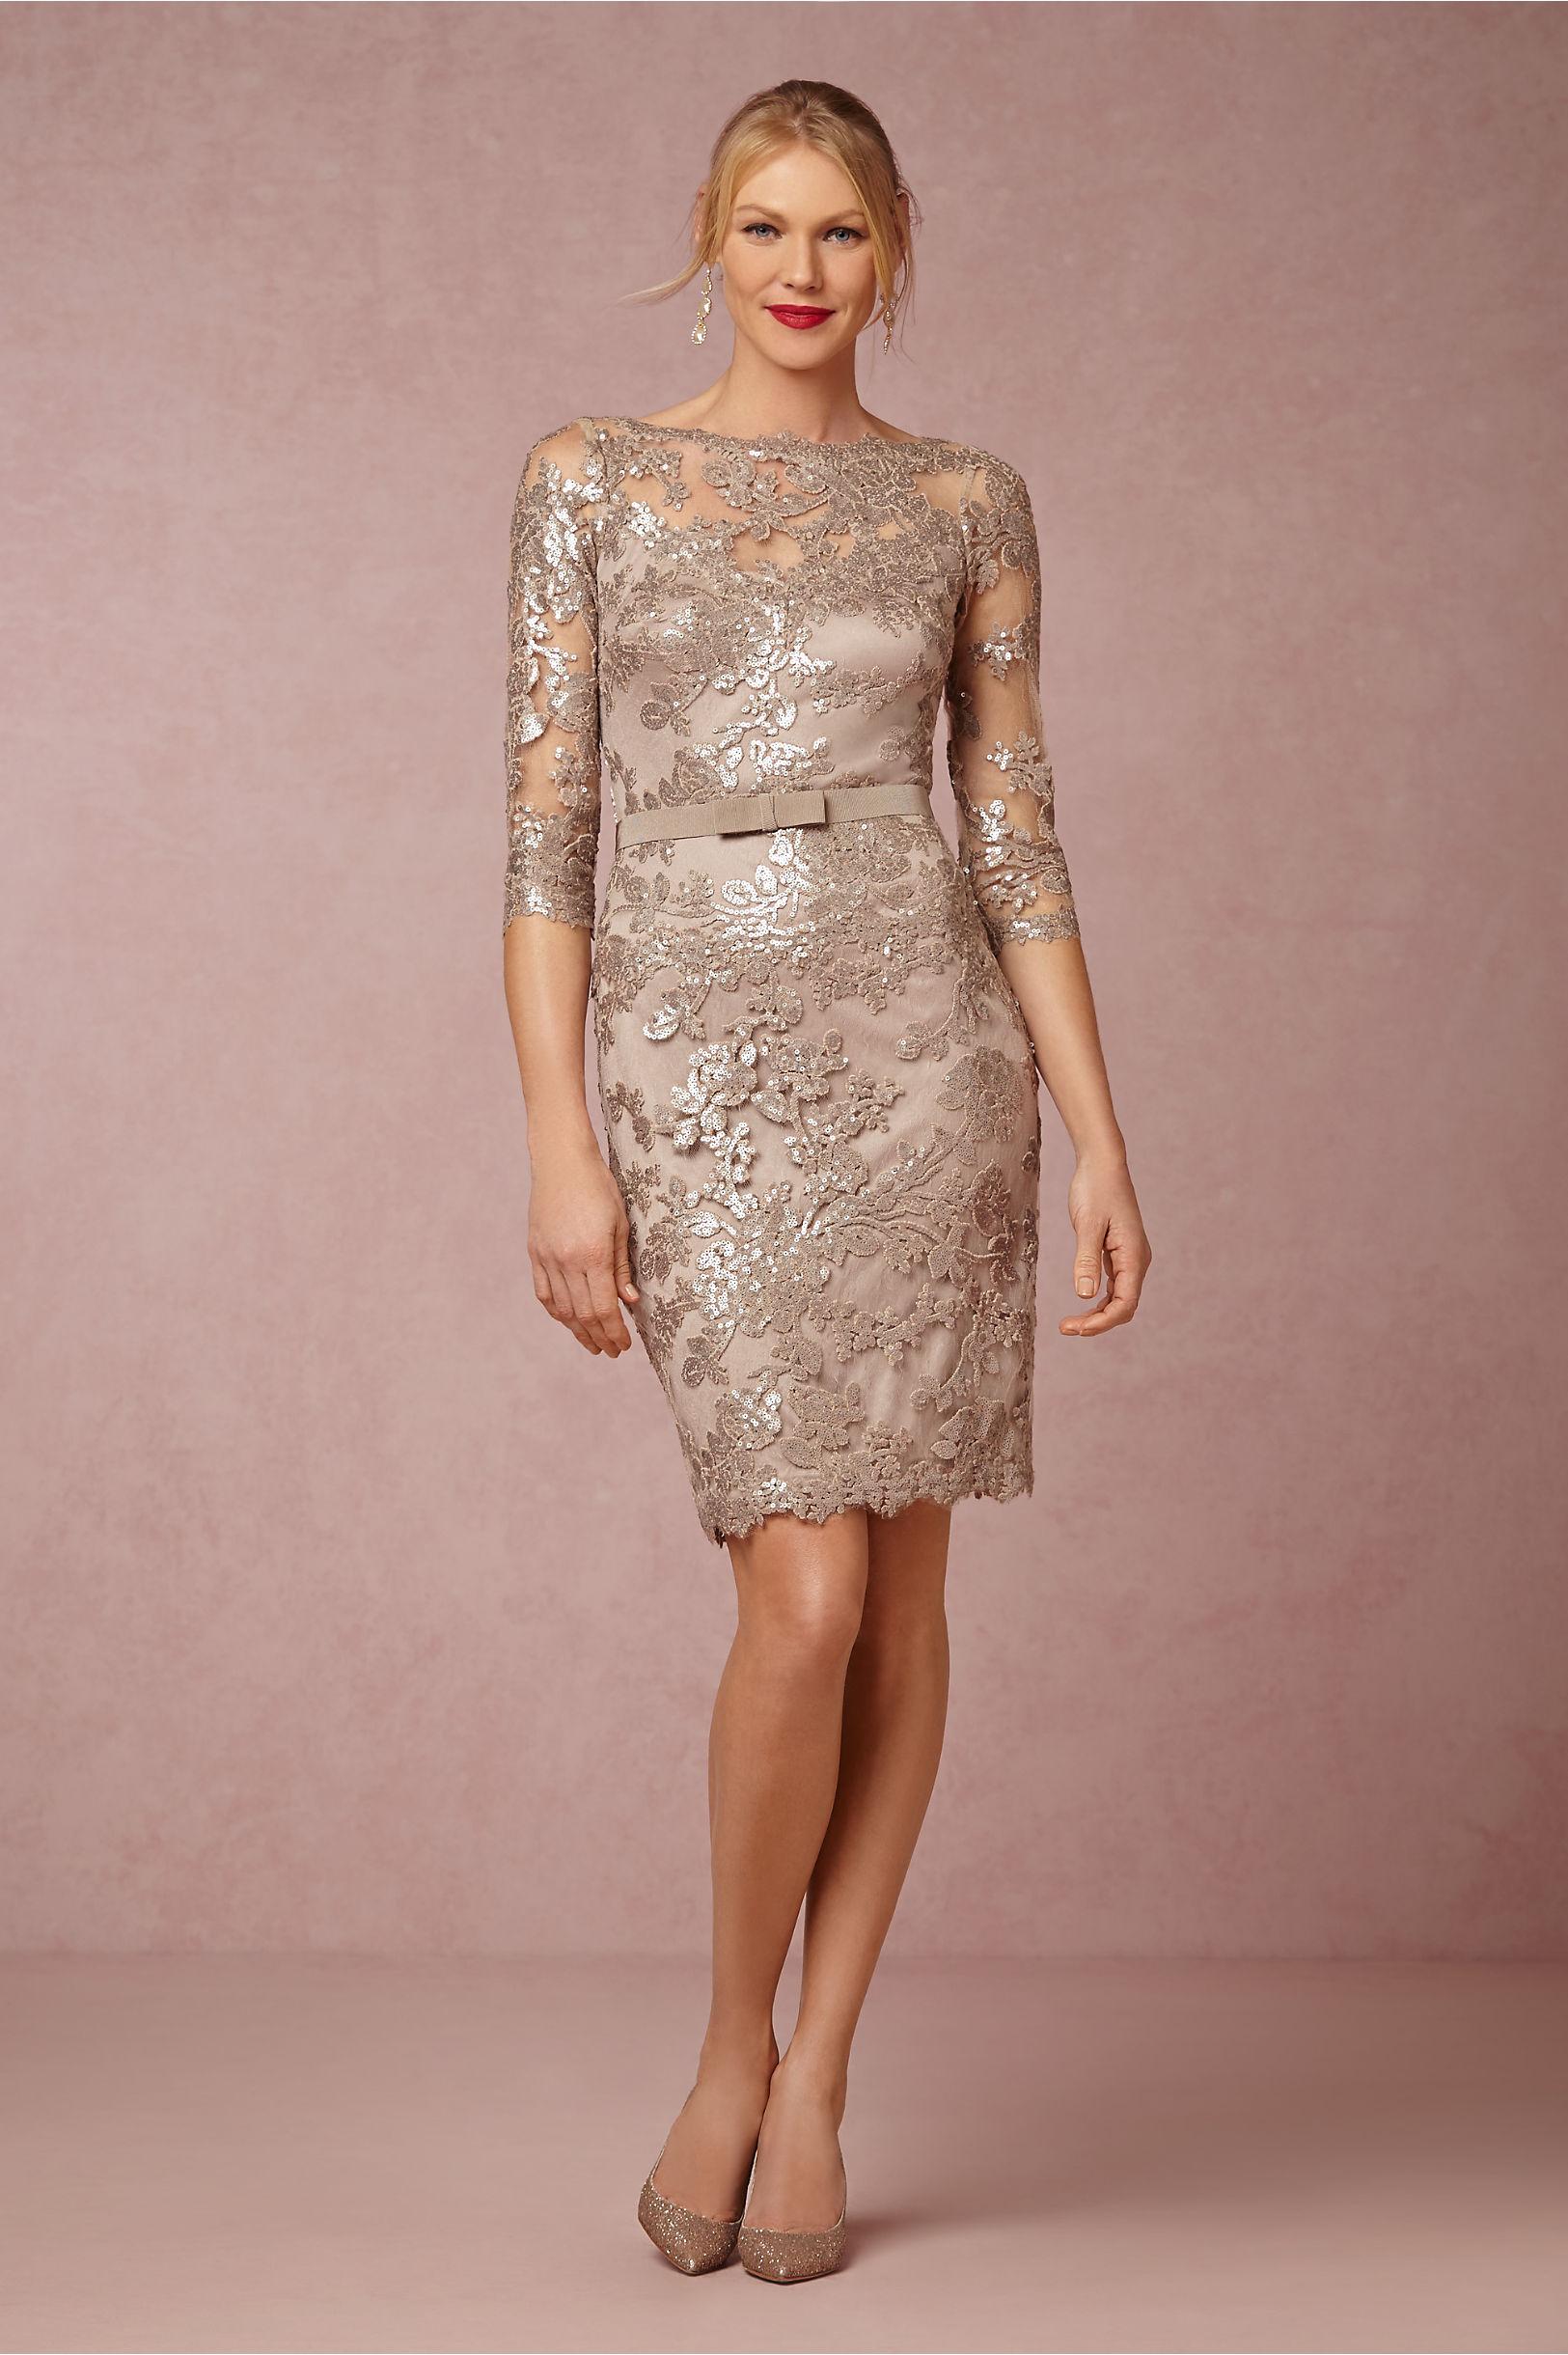 Liv Dress in Sale | BHLDN